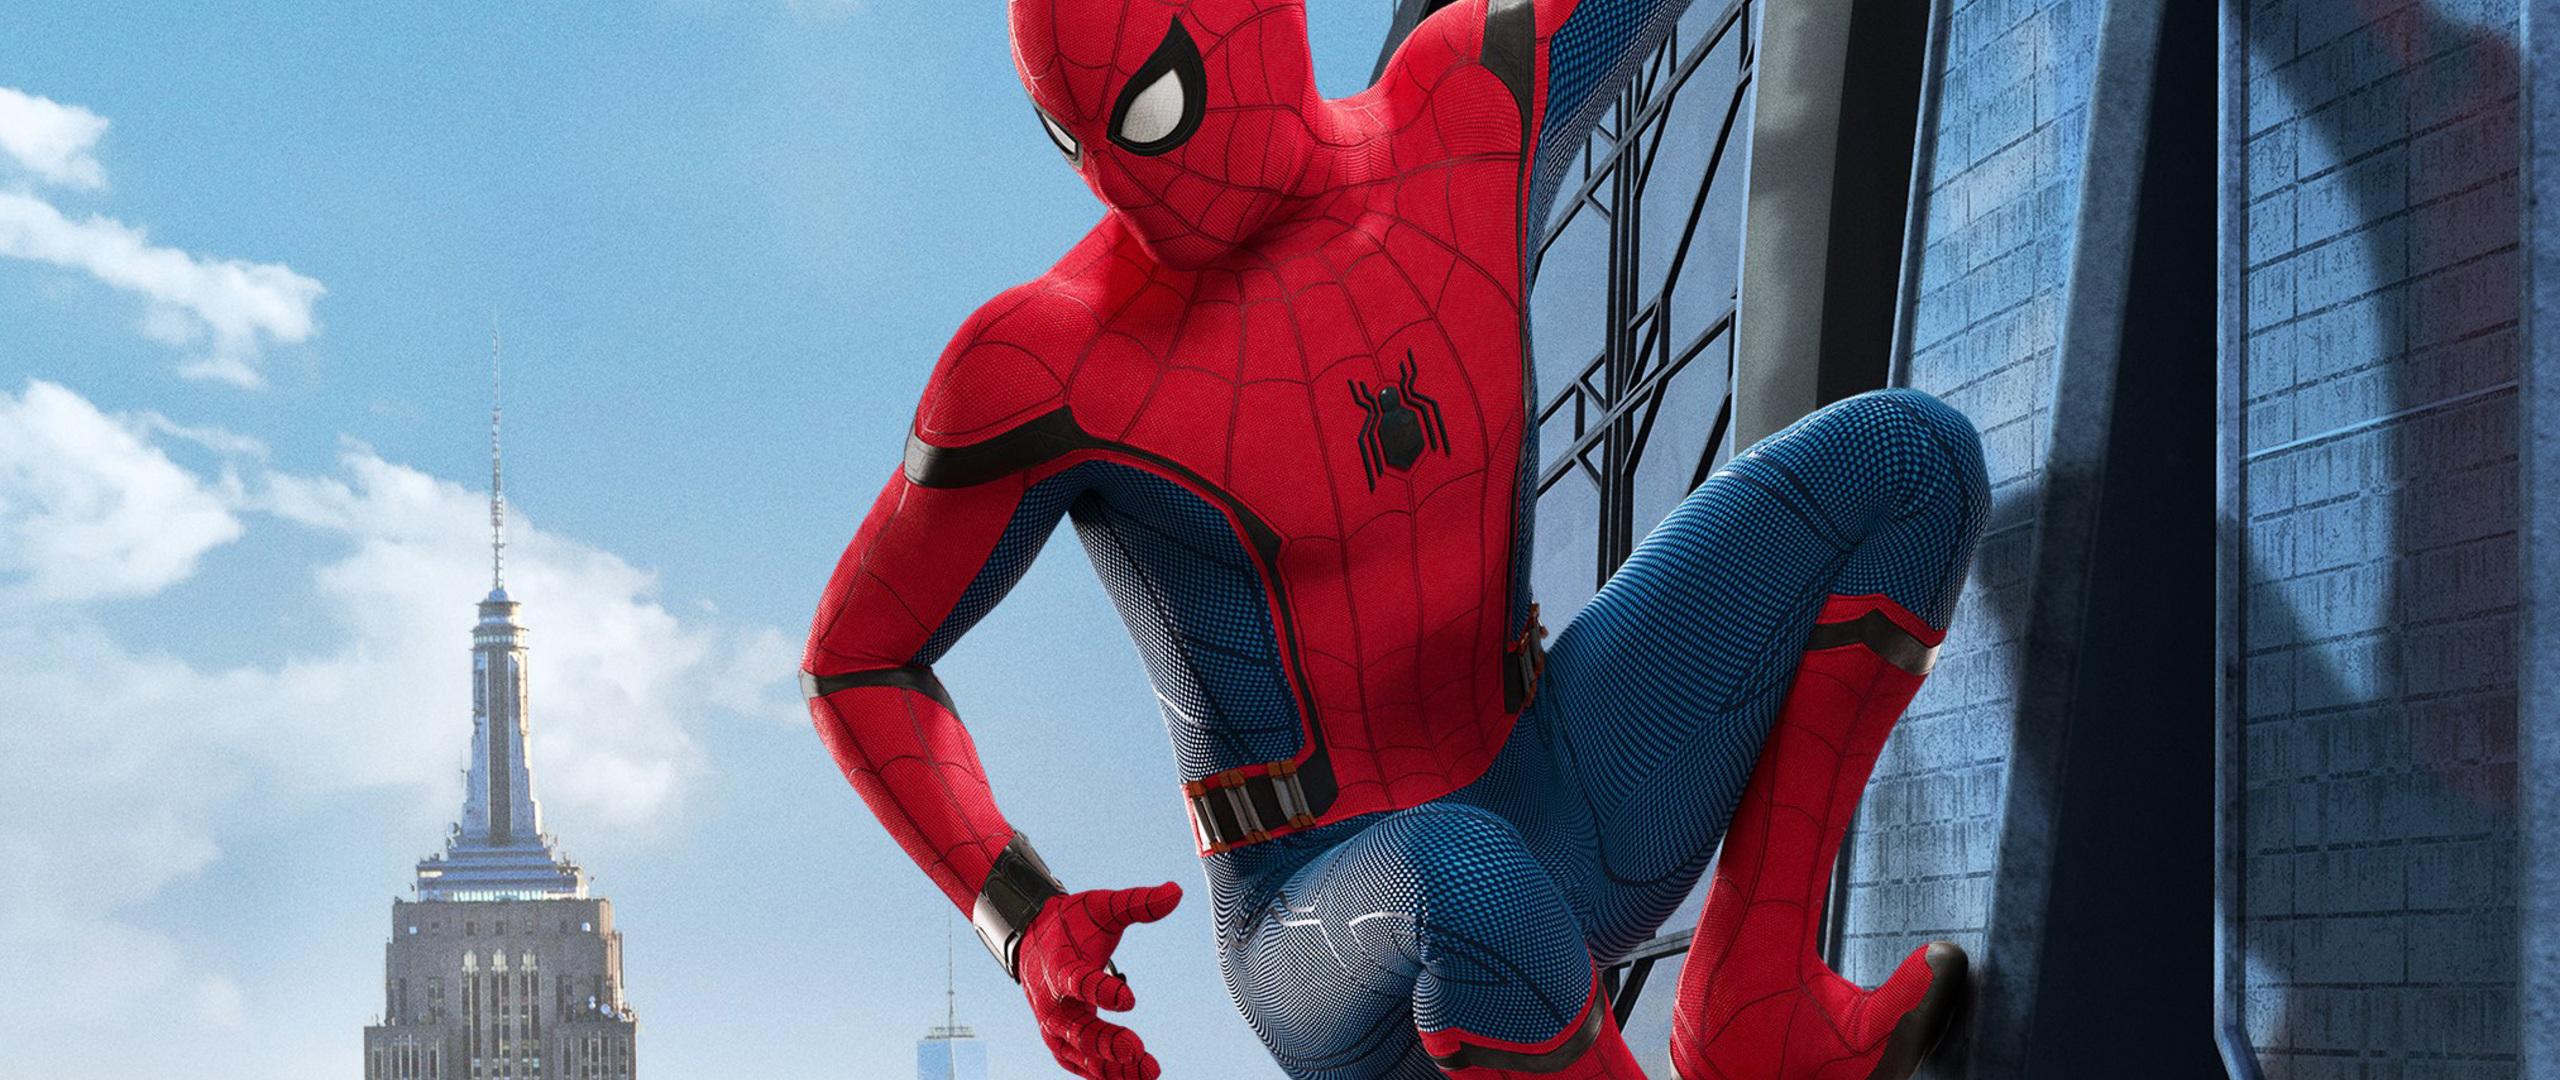 Comics <b>Spiderman</b> HD <b>Wallpapers</b>, <b>Desktop Backgrounds</b>, Mobile ...